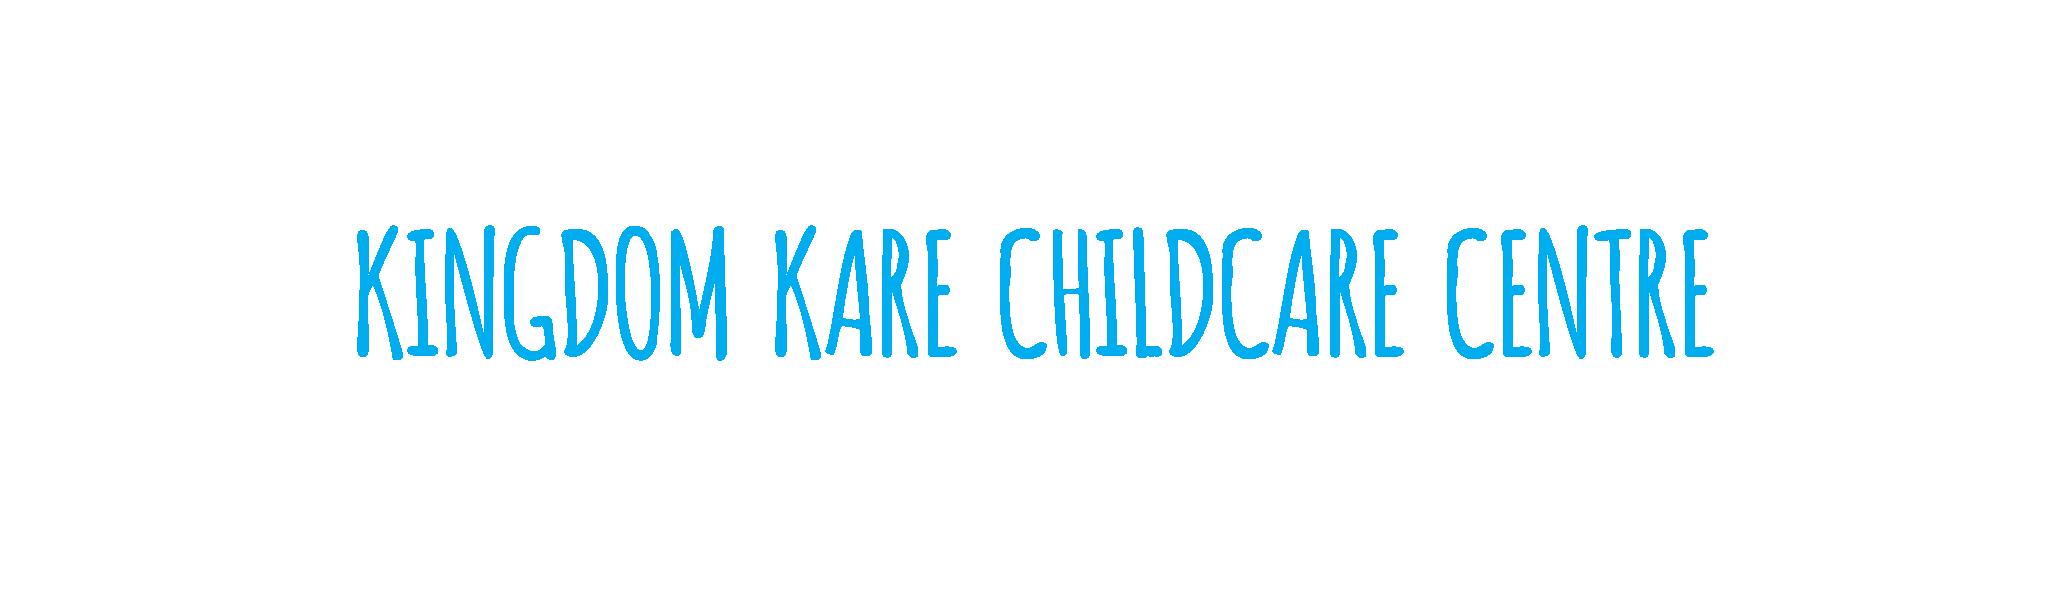 Kingdom-Kare-Childcare-Centre-Rotating-Header.png